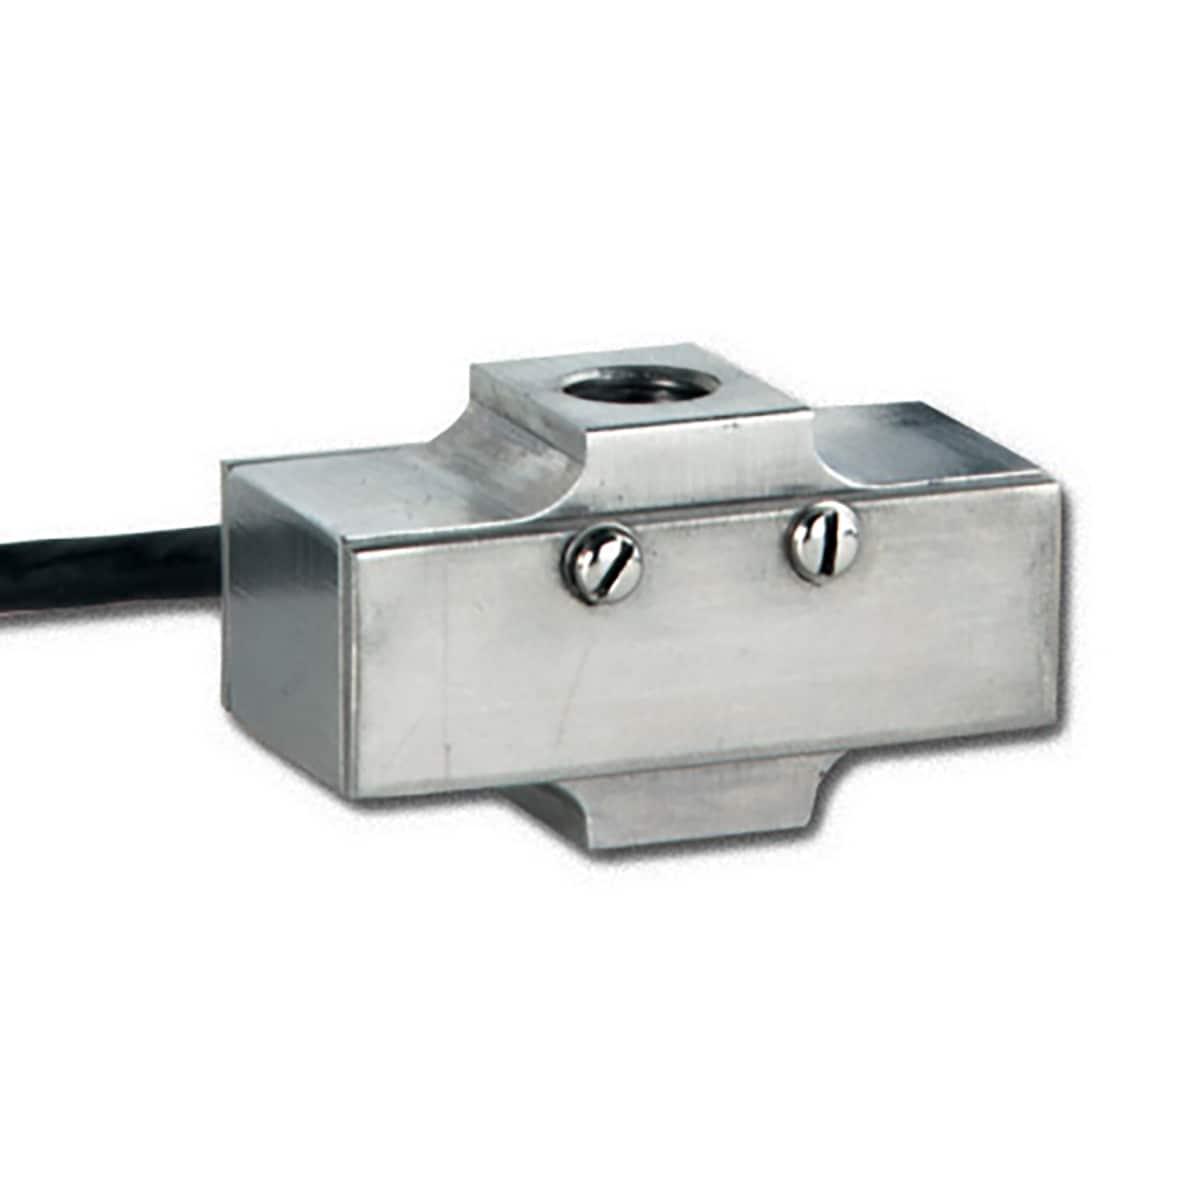 Miniature, Low Profile, Tension & Compression Load Cells